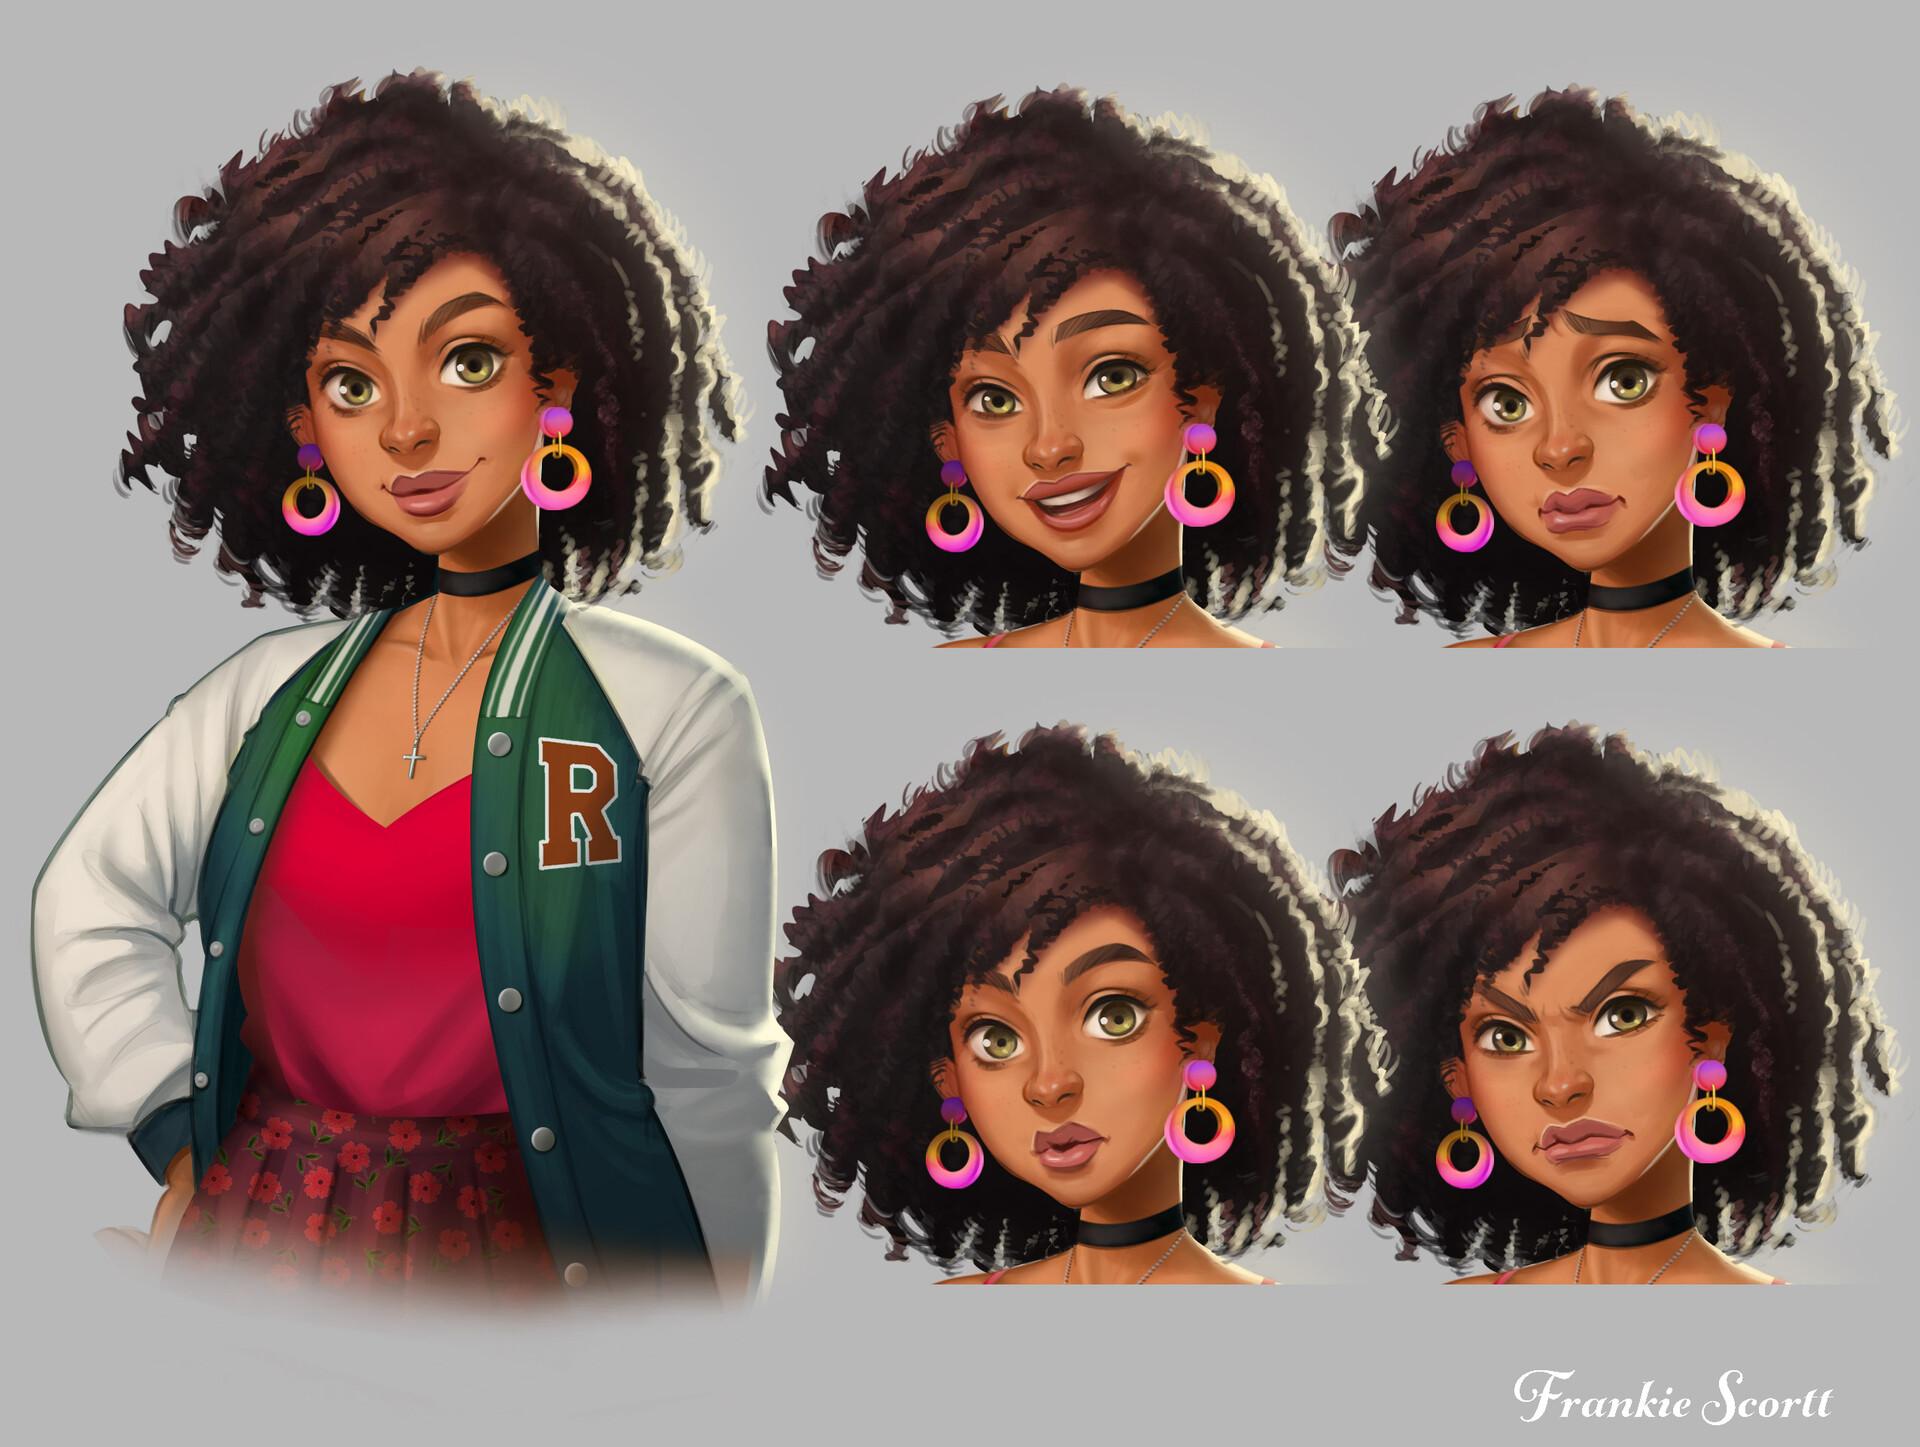 Character Art: Frankie